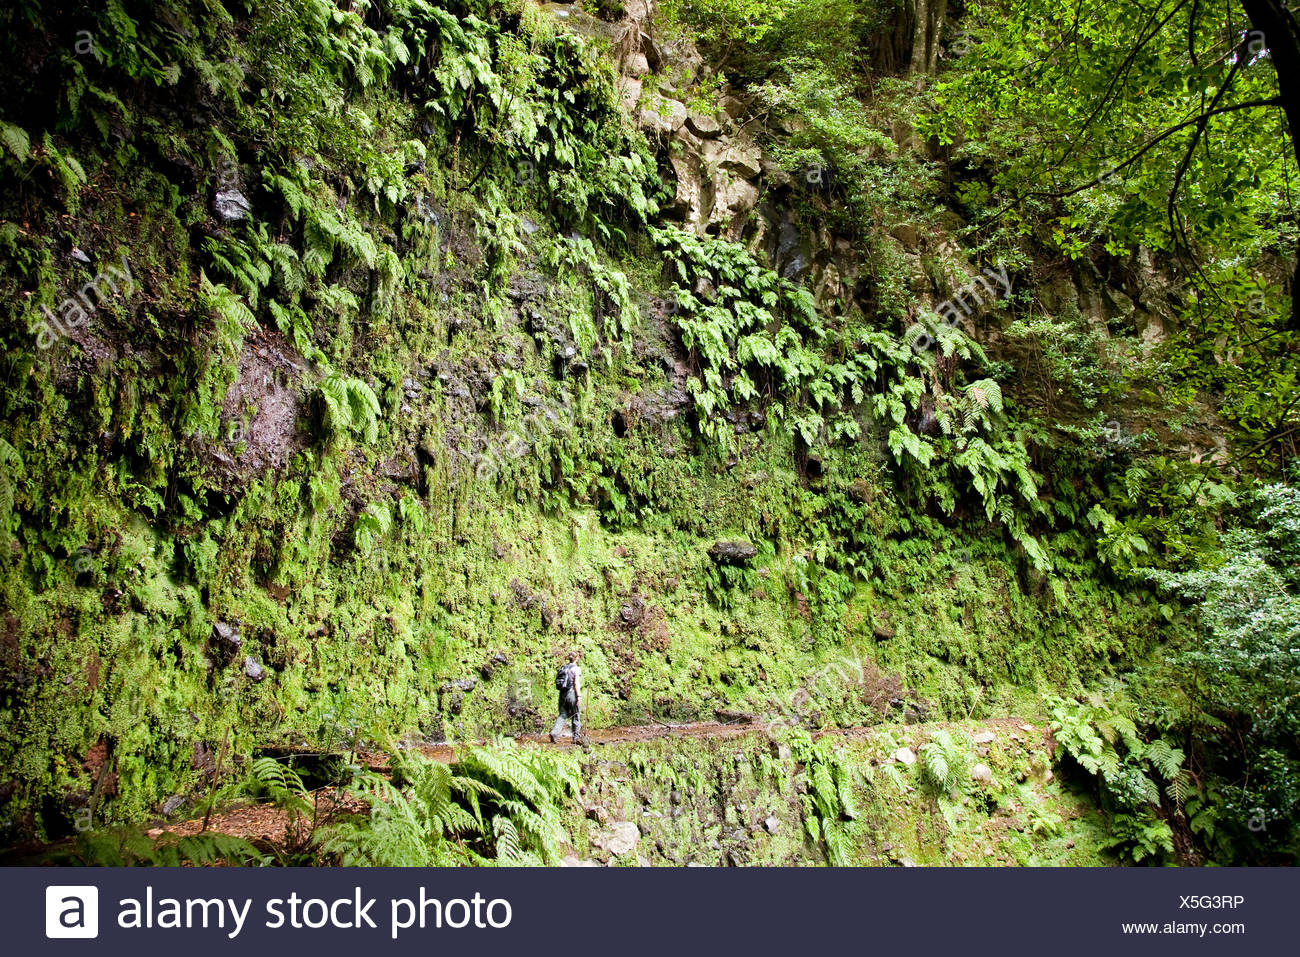 Hiker at the irrigation canal Levada de Janela, in Ribeira da Janela, Madeira, Portugal, Europe - Stock Image